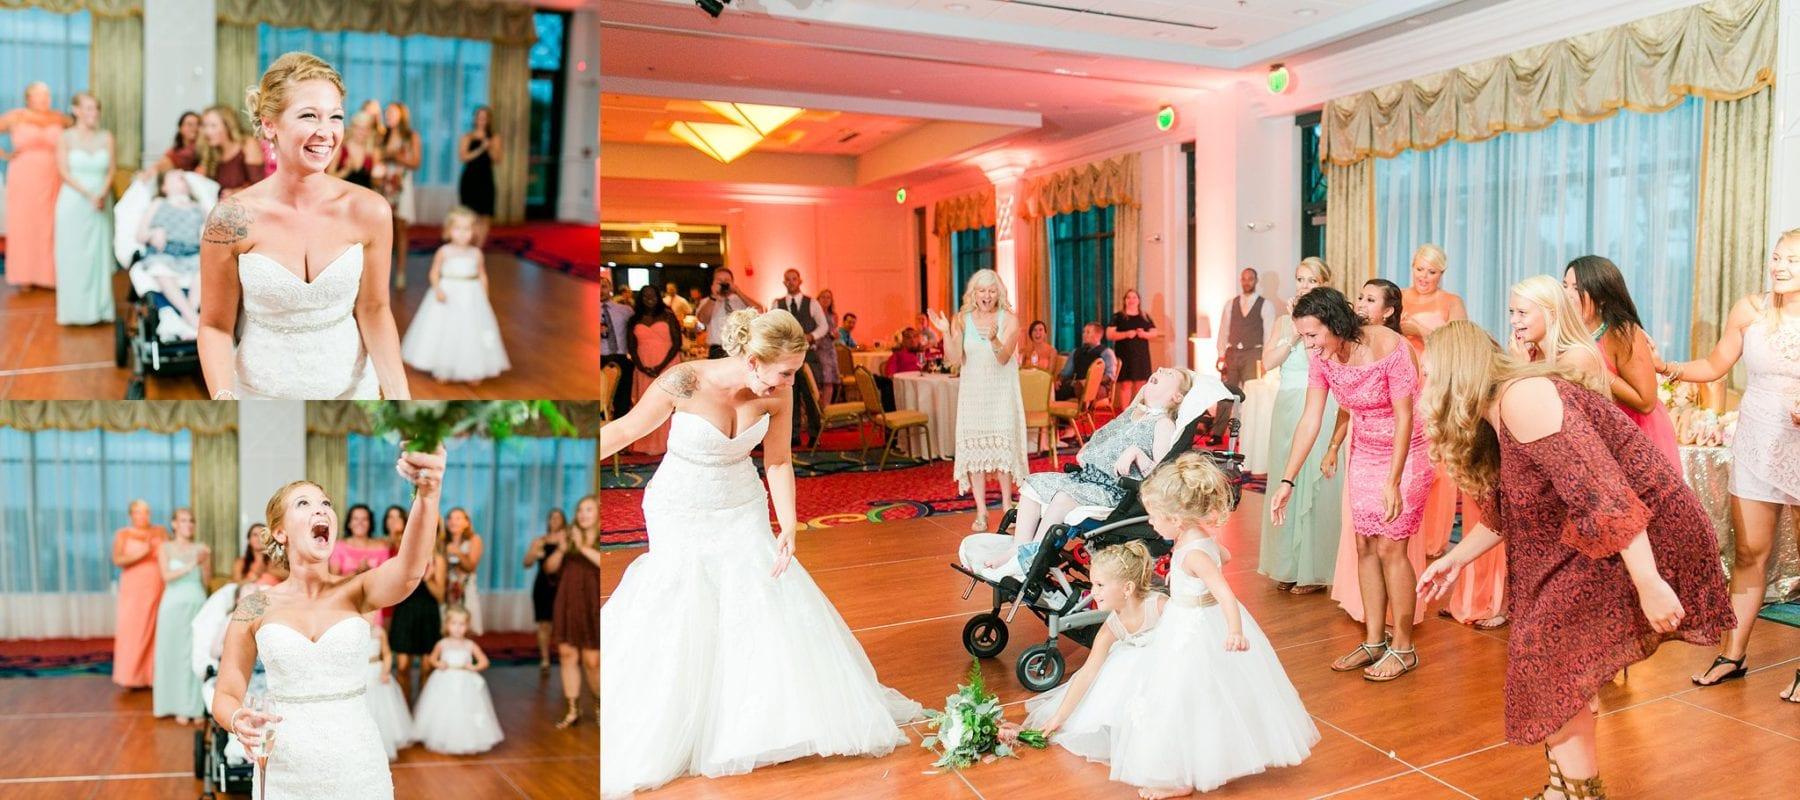 Waters Edge Wedding Photos Maryland Wedding Photographer Megan Kelsey Photography Katie & Conor-642.JPG